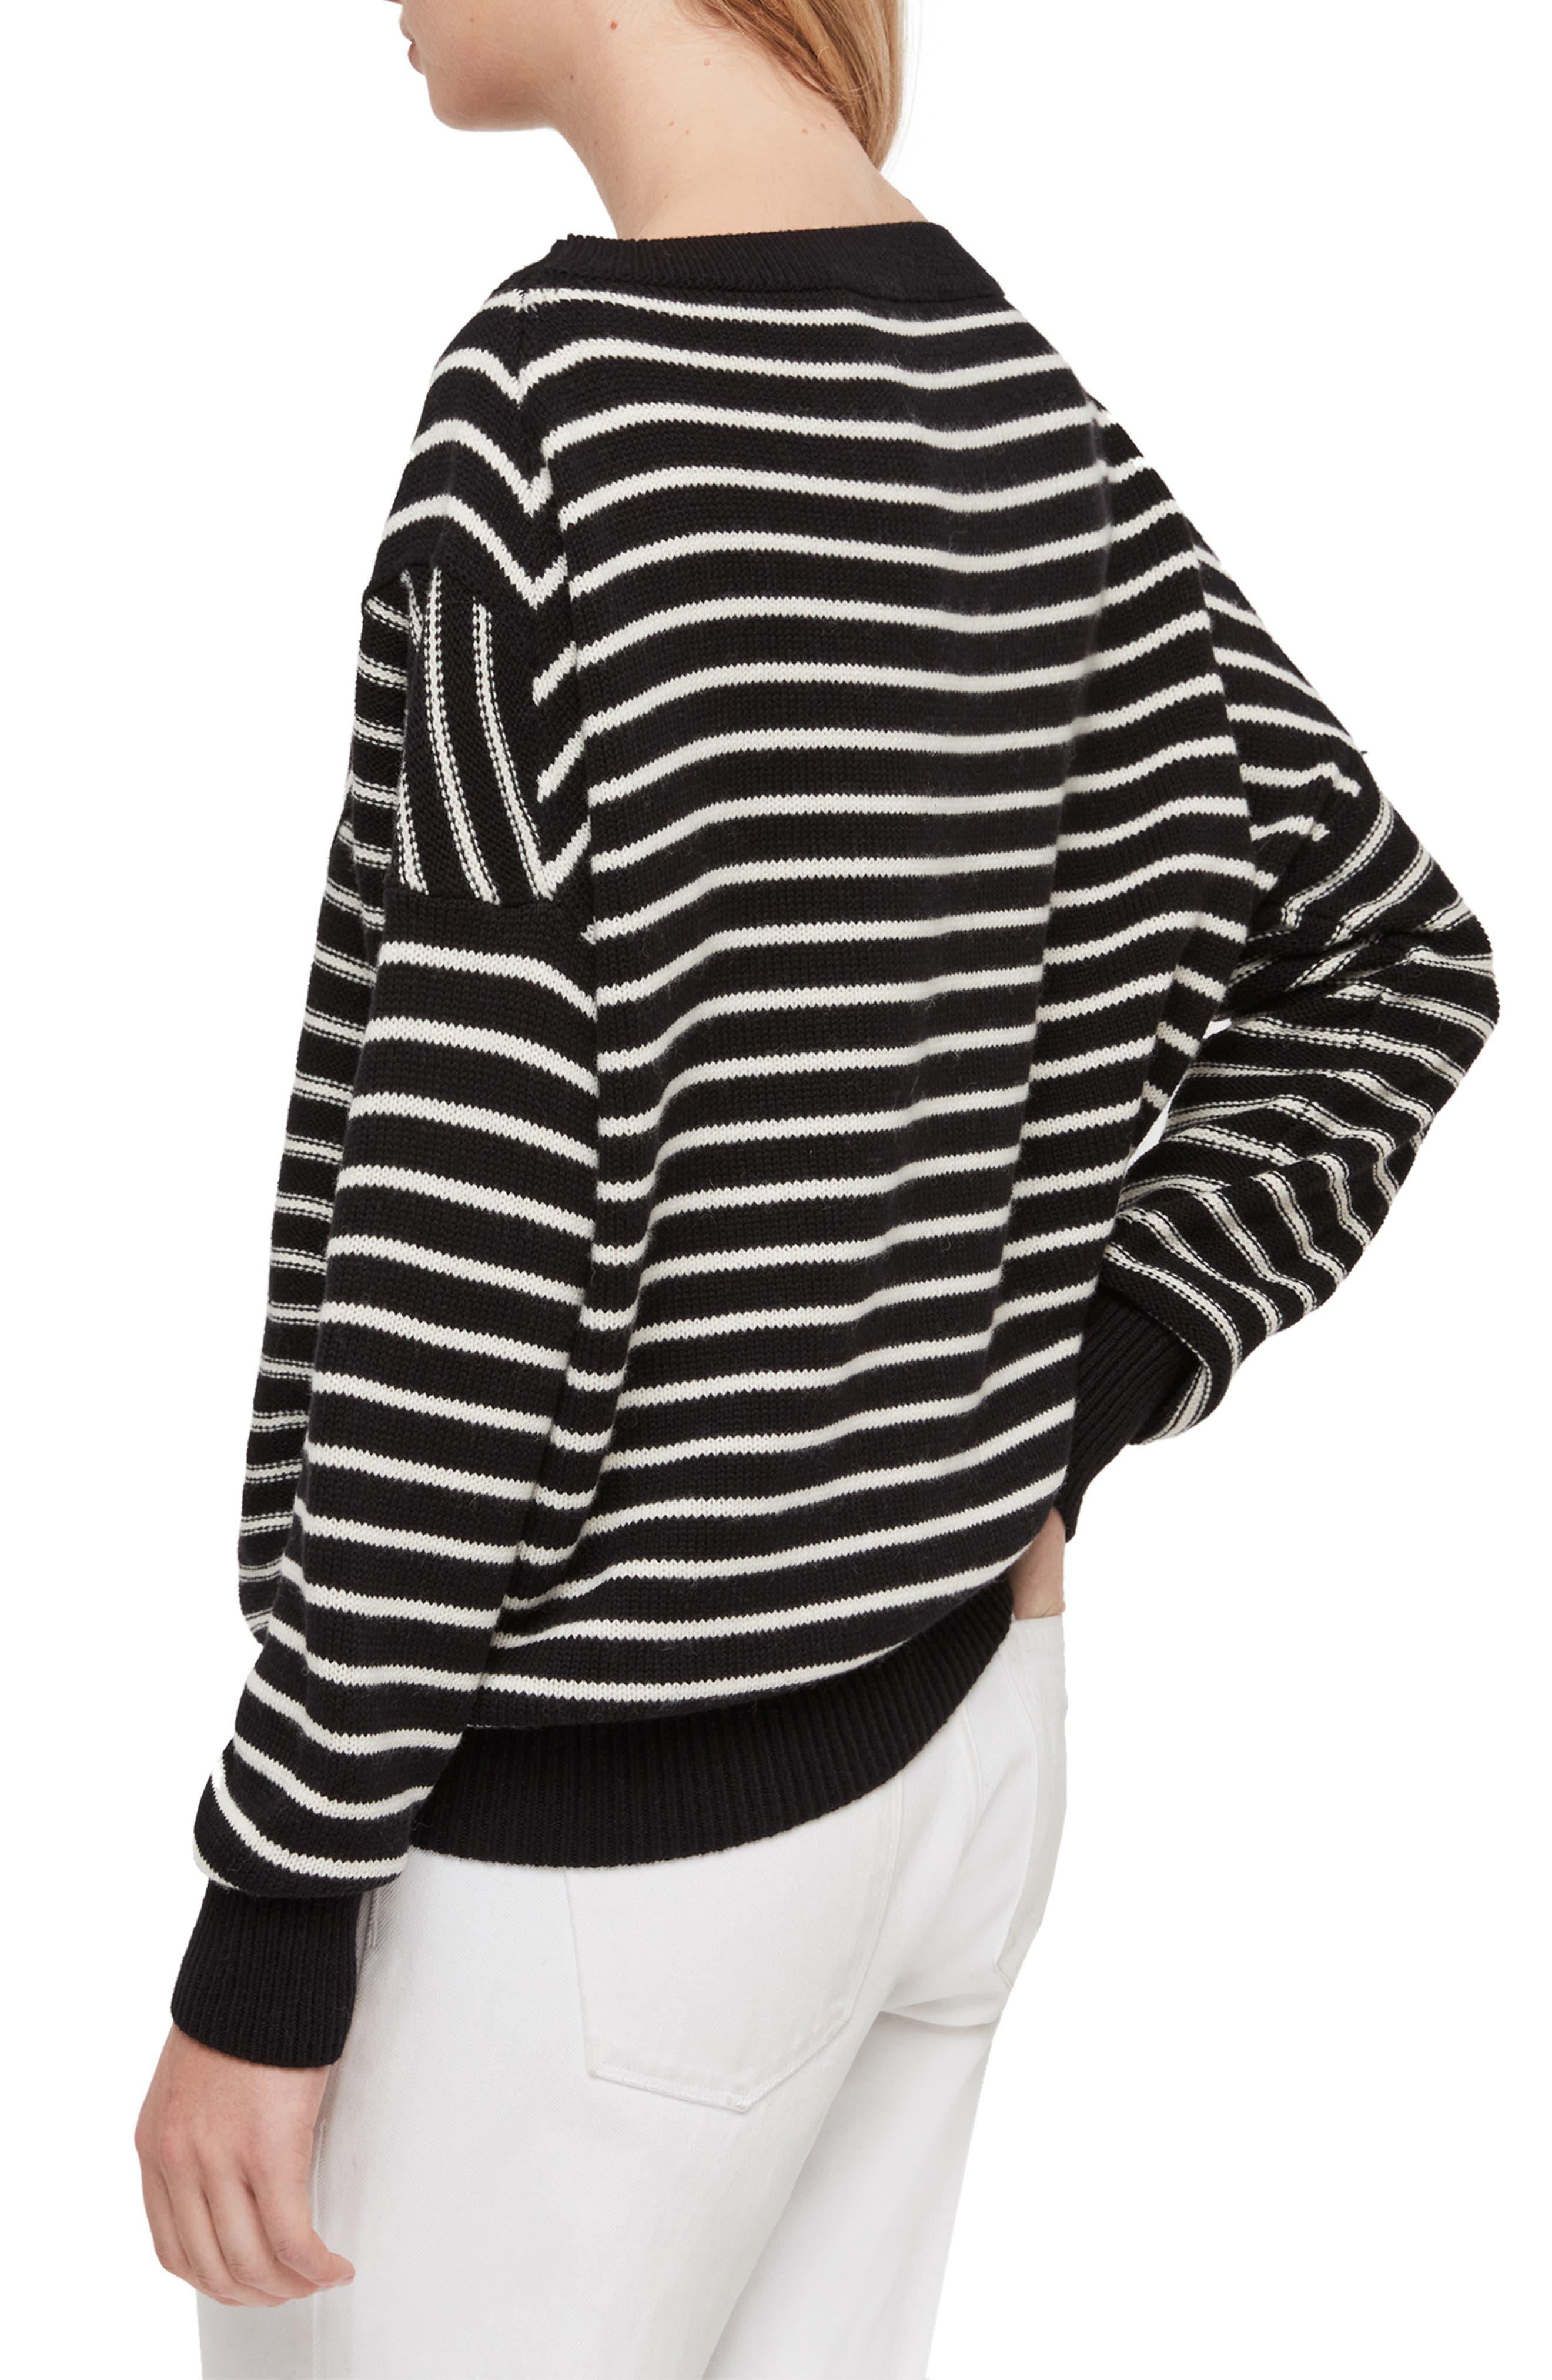 ALLSAINTS, Vani Sweater, Alternate thumbnail 2, color, BLACK/ CHALK WHITE